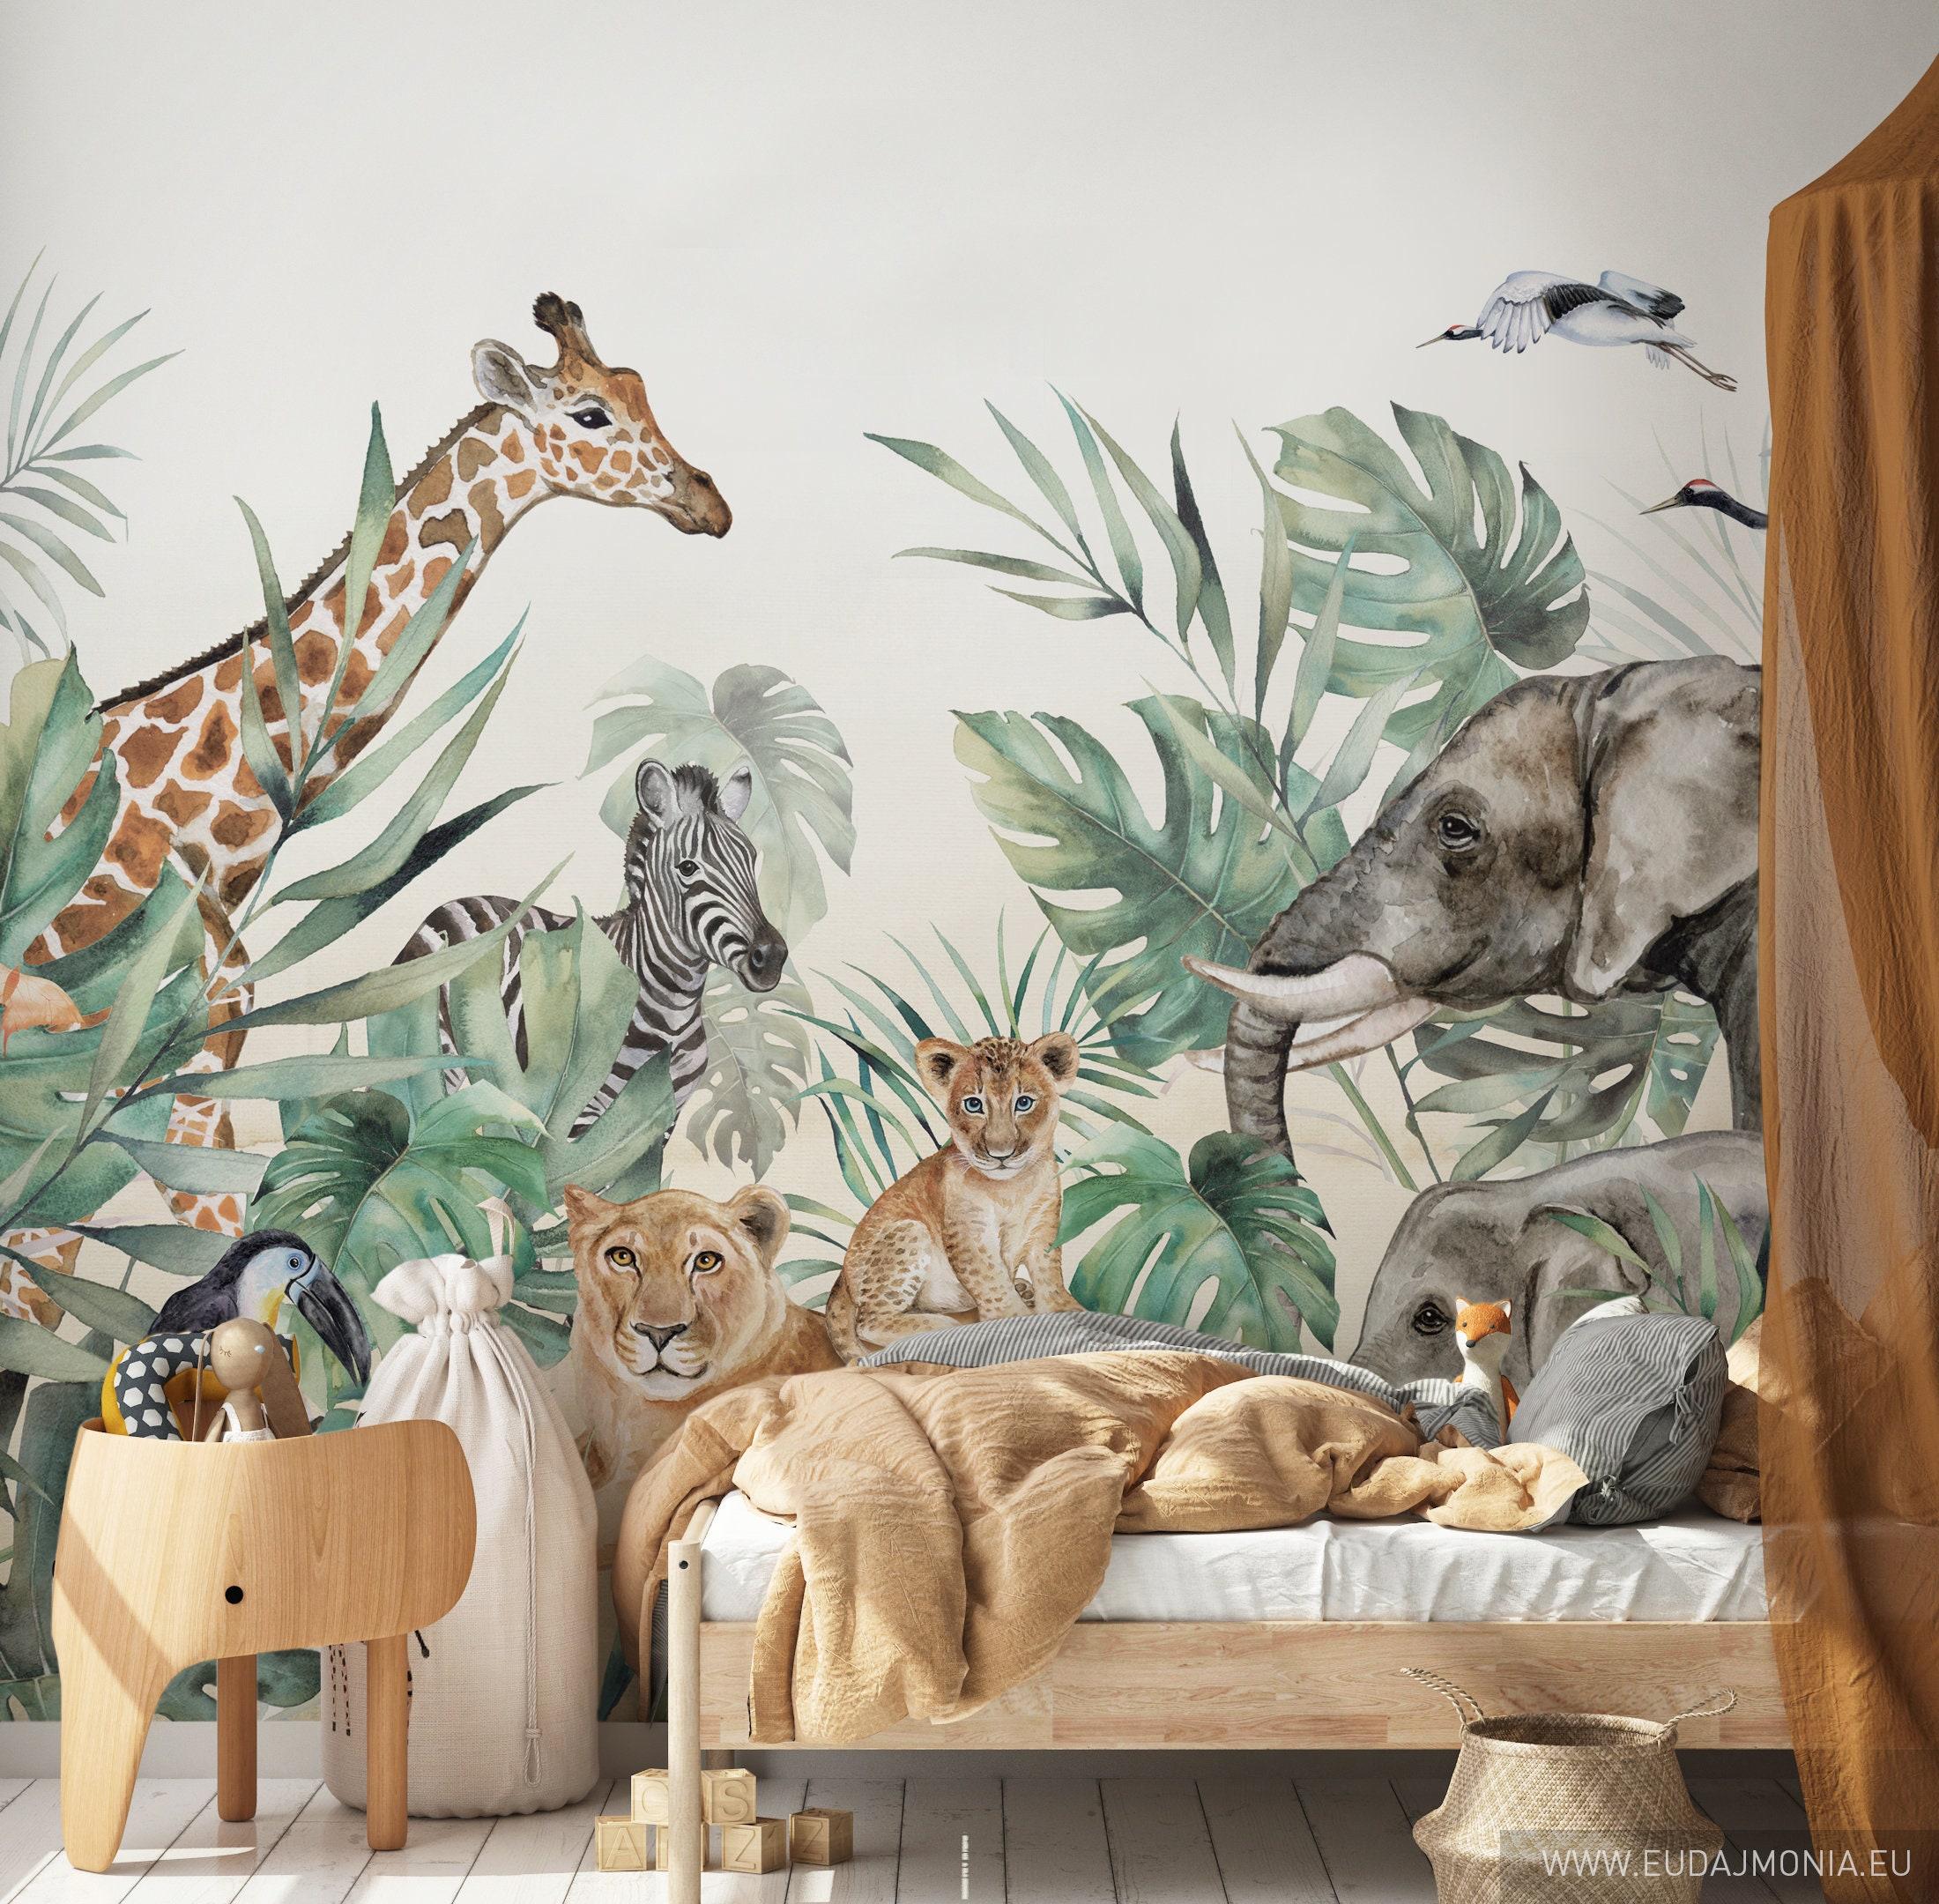 305x204 Fototapete Kinderzimmer Dschungeltiere Safari Tiere Wandbild Tapete ca